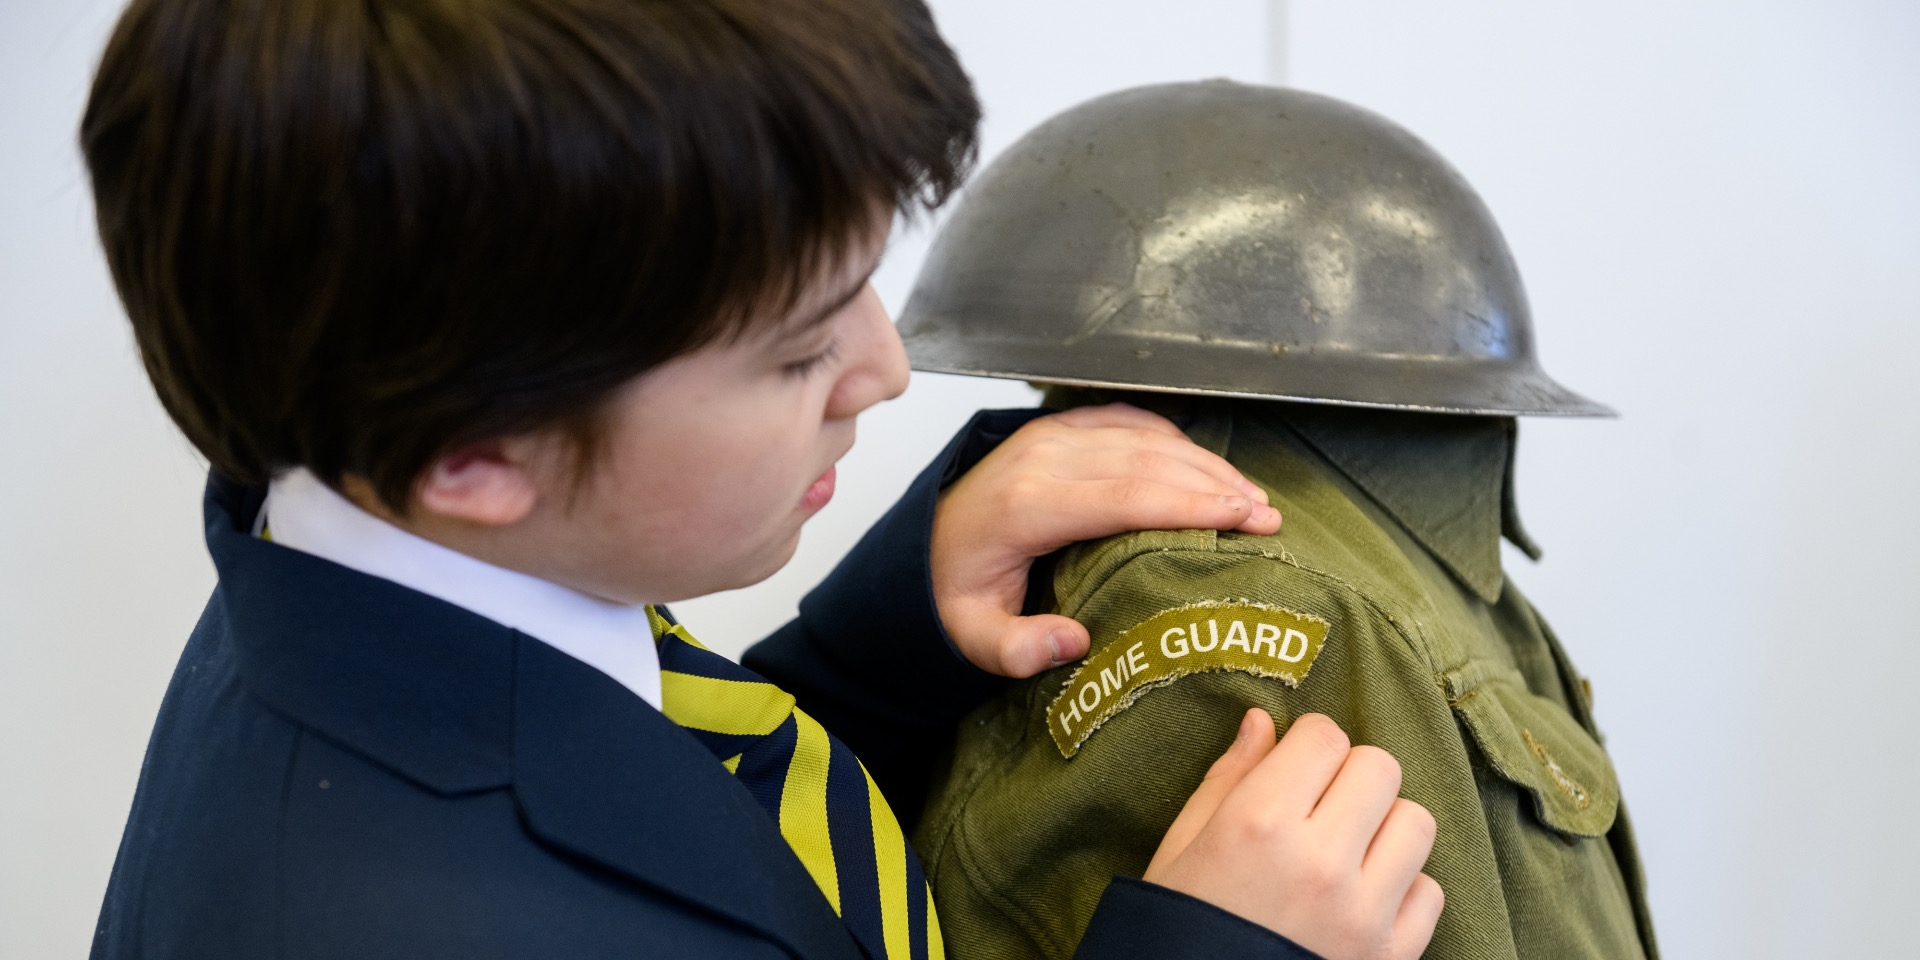 School boy examining a Home Guard uniform